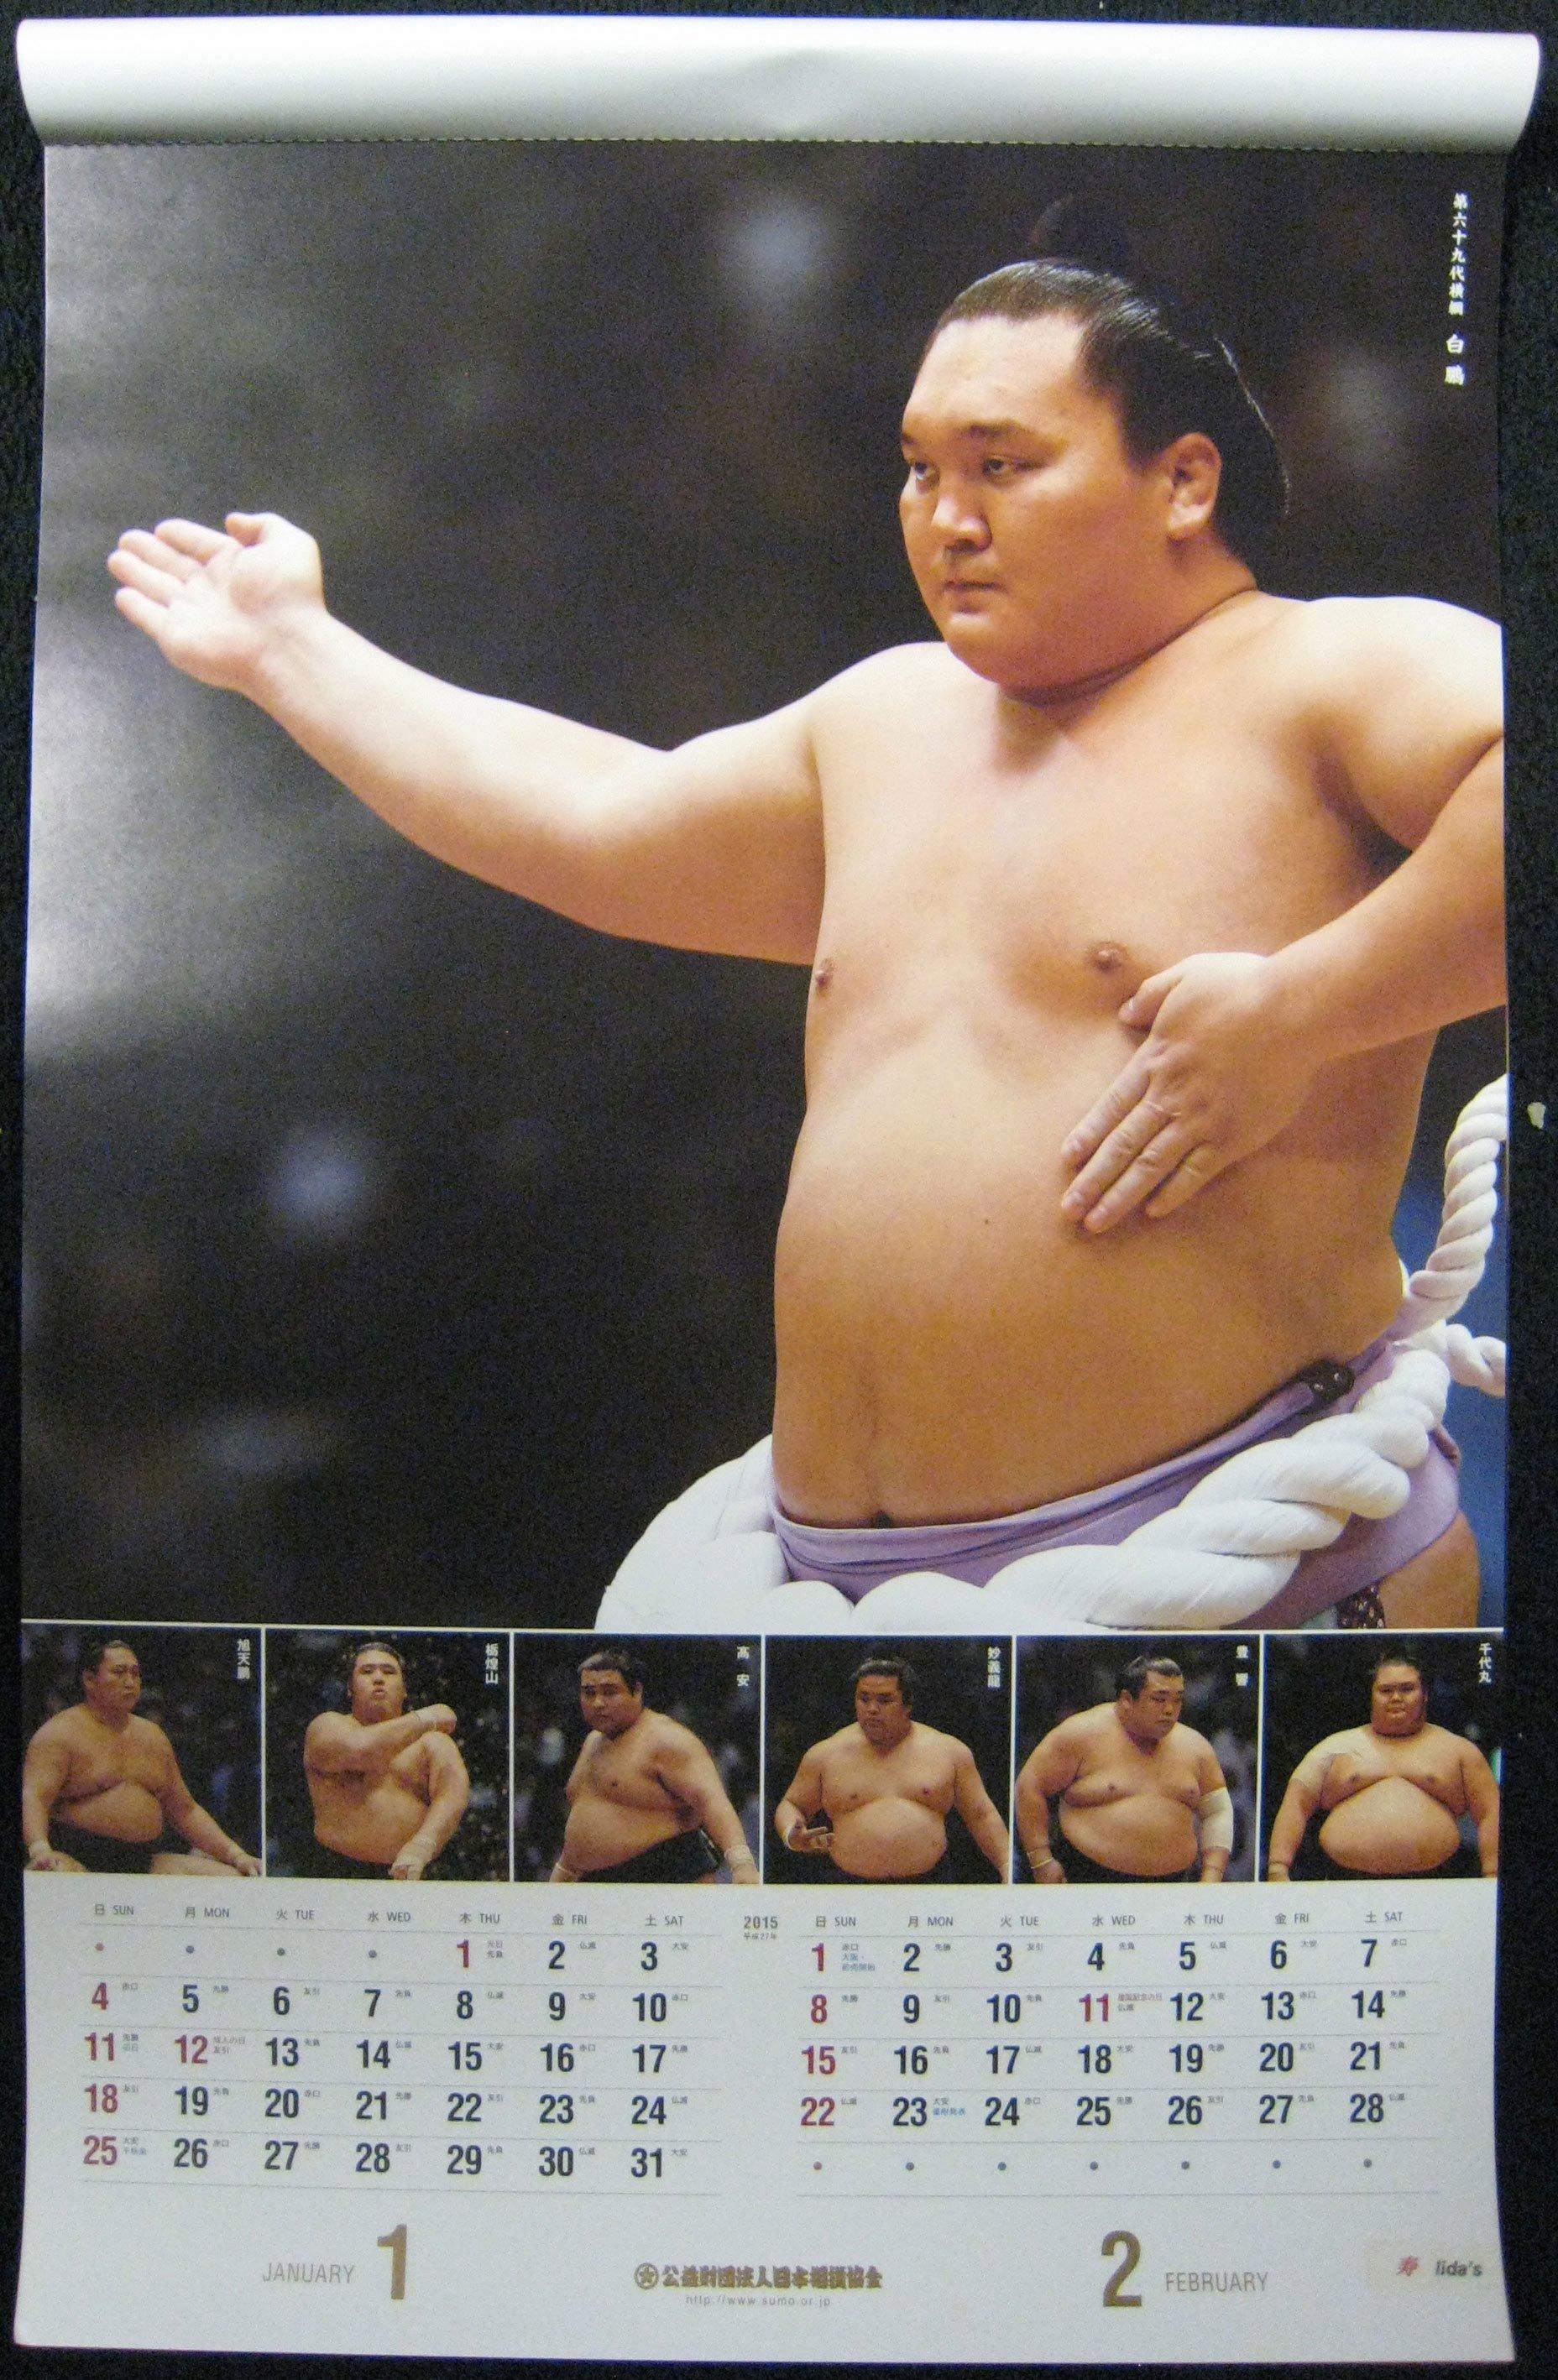 Japan sumo association 2015 calendar in Honolulu, HI